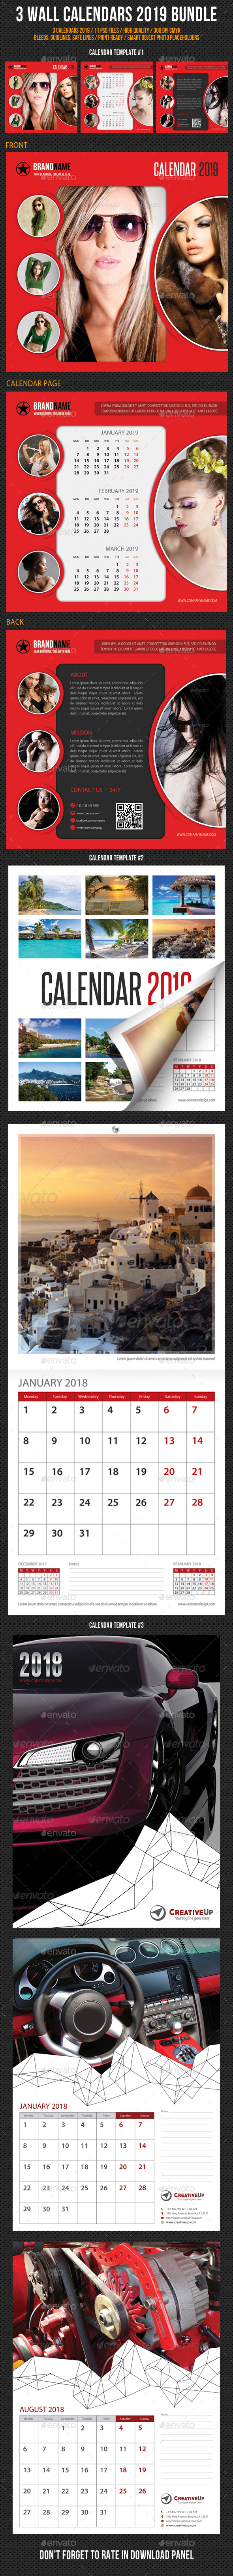 Wall Calendars 2019 Bundle V15 - Calendars Stationery